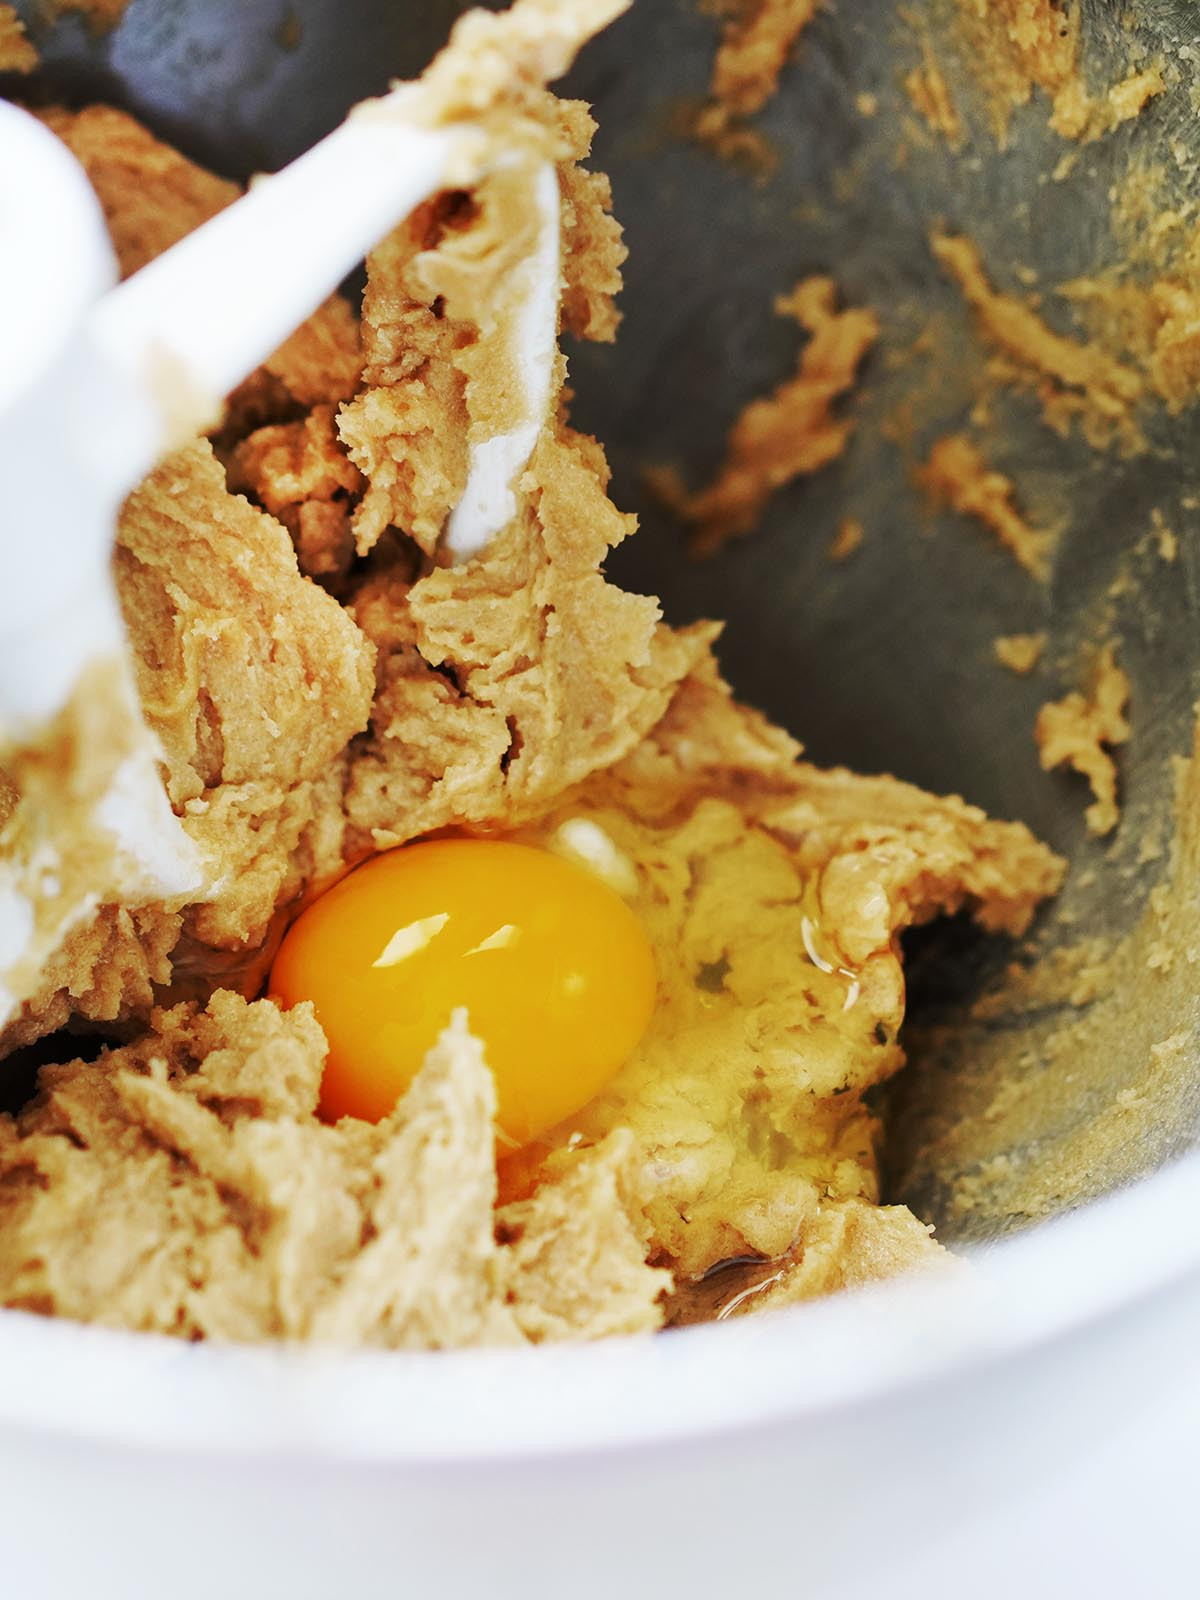 An egg on top of cookie dough inside a mixer.